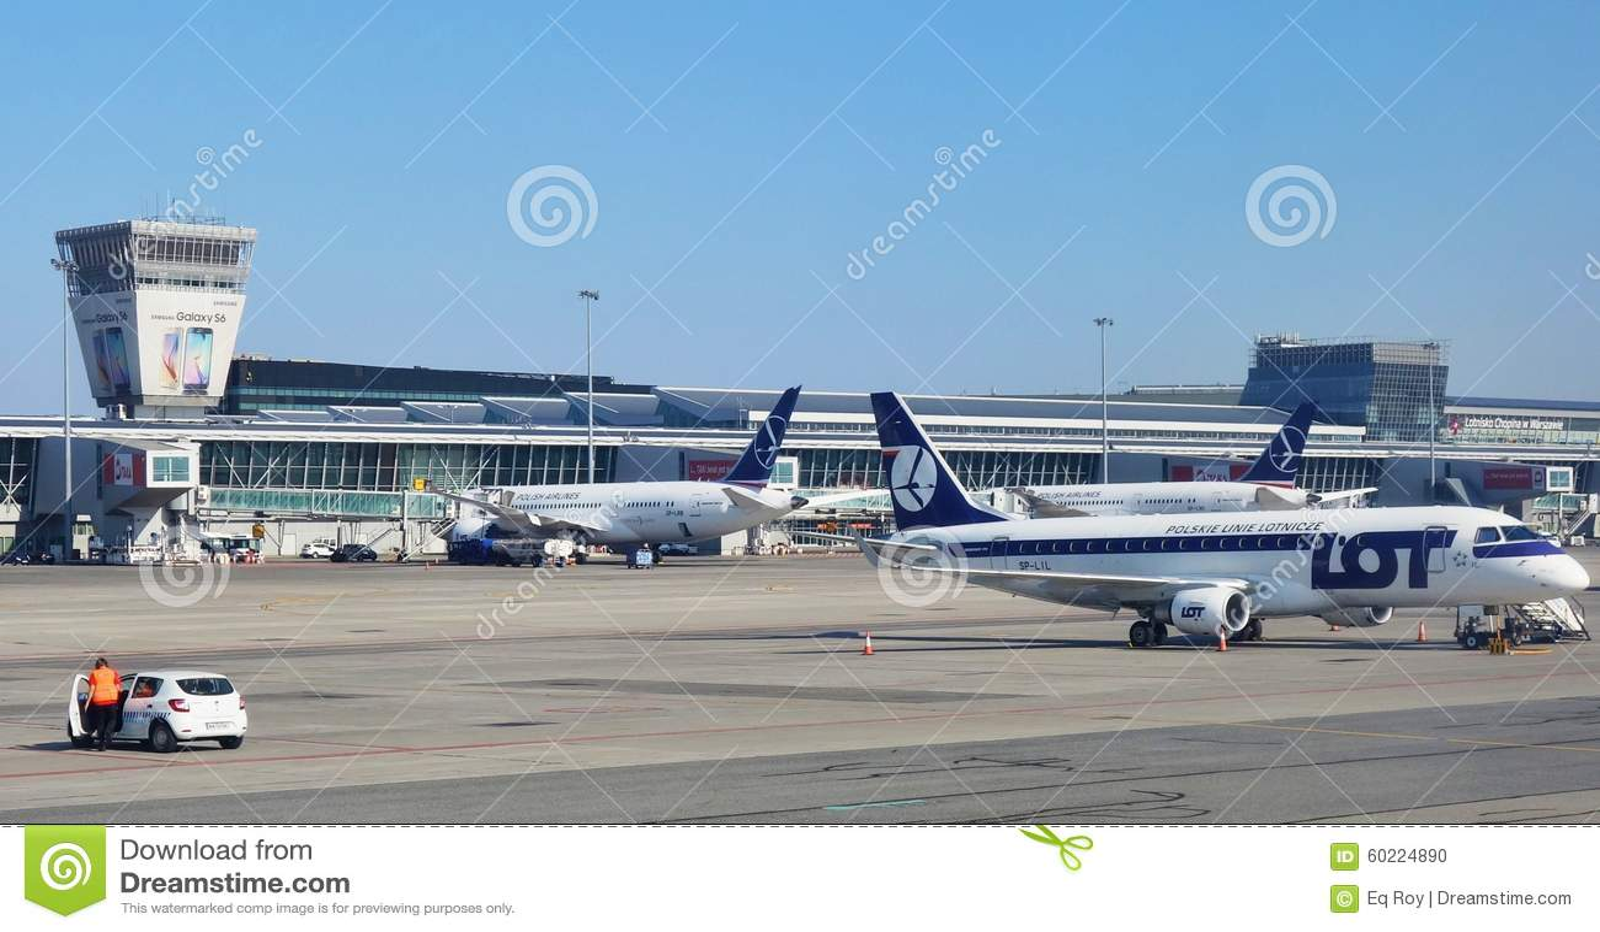 Aeroporto Waw : The warsaw chopin airport waw editorial image image of